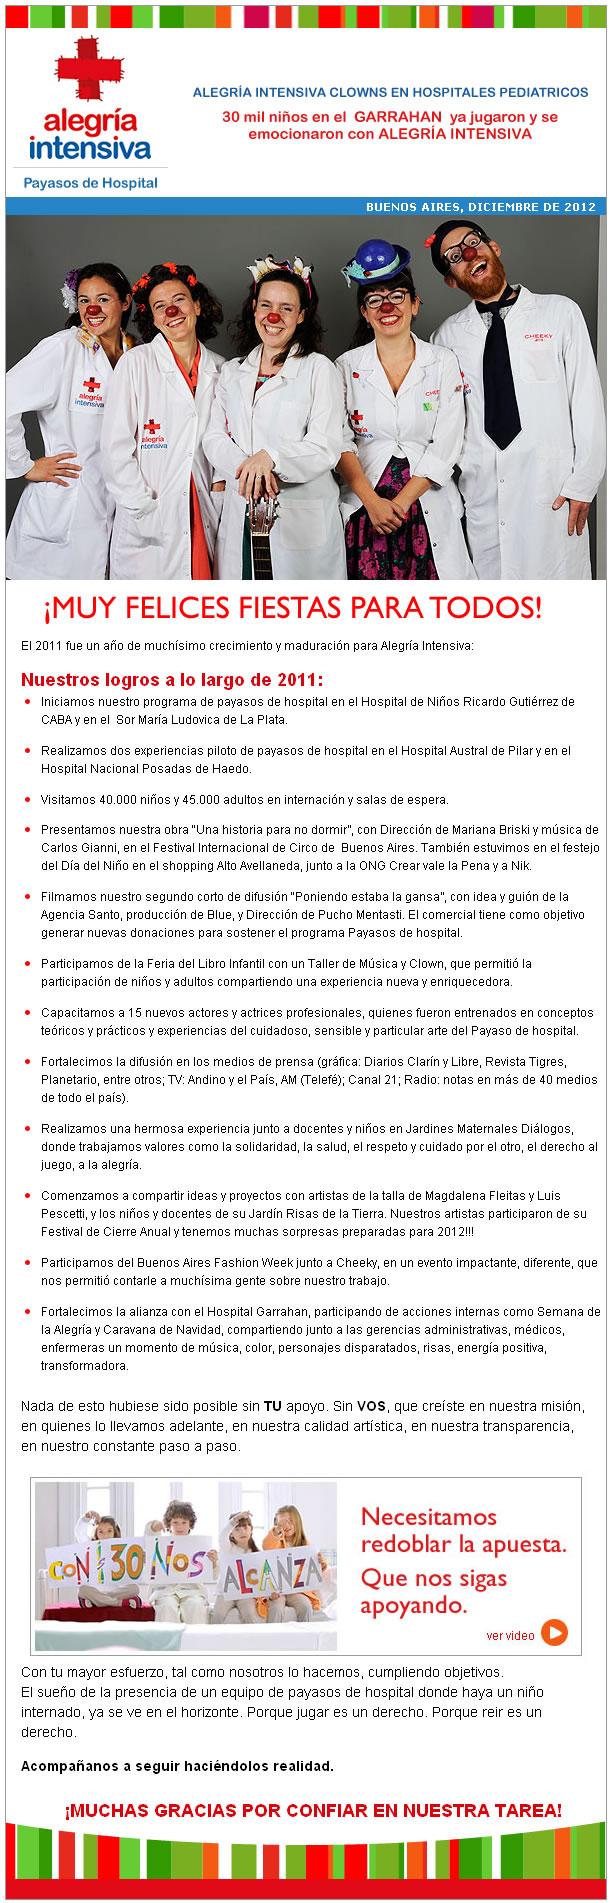 newsletter 12 | Diciembre 2012